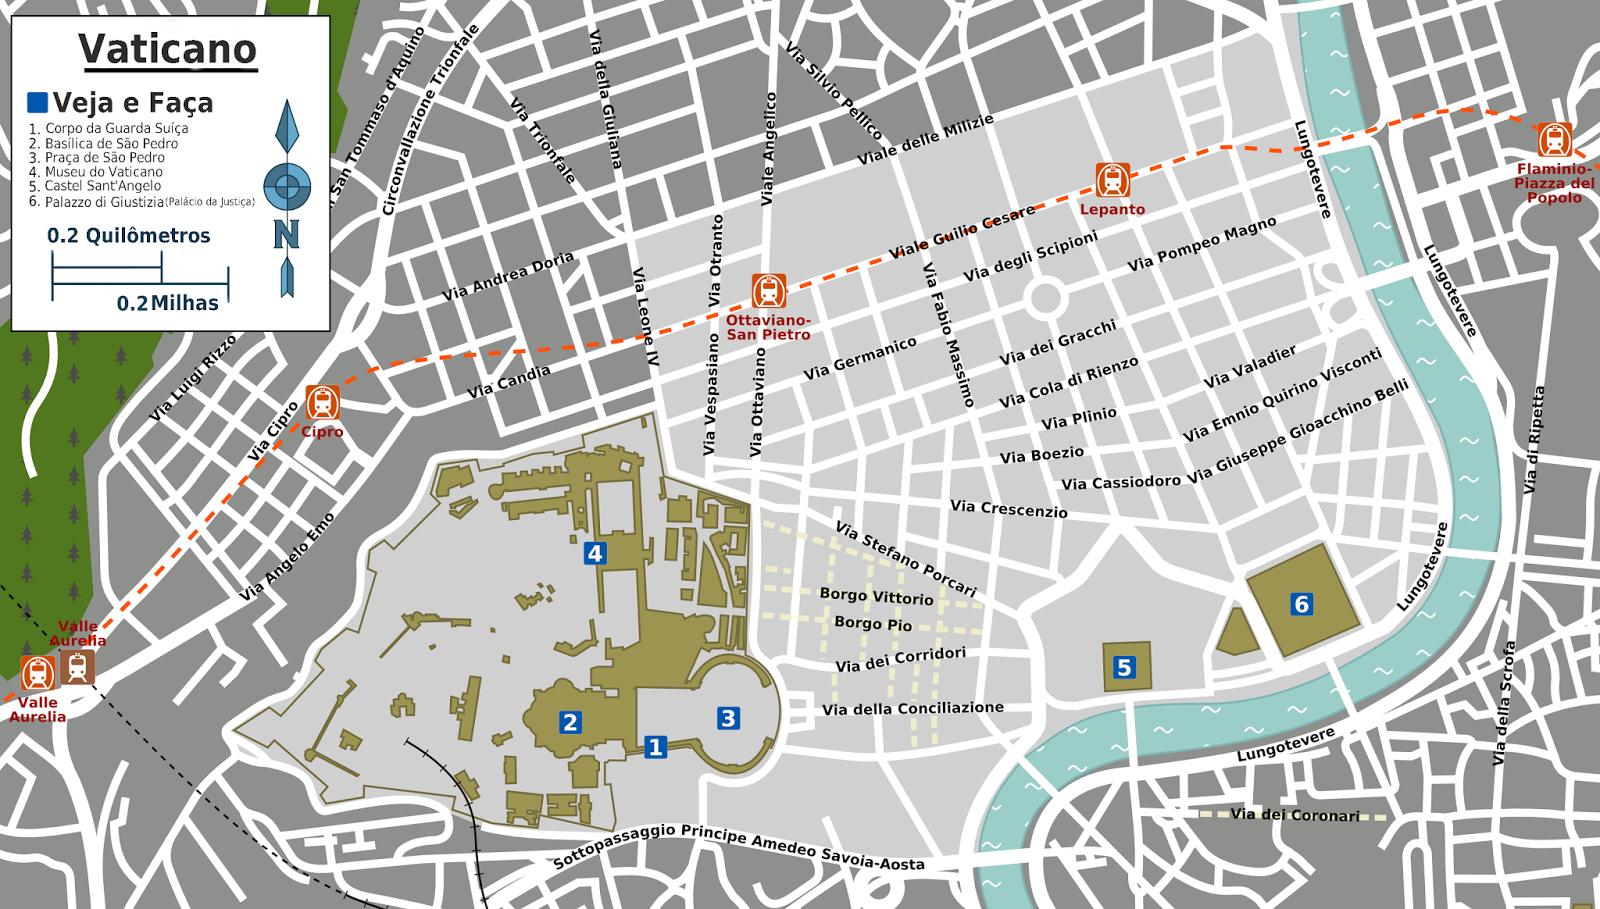 Map of  Vatican Museums